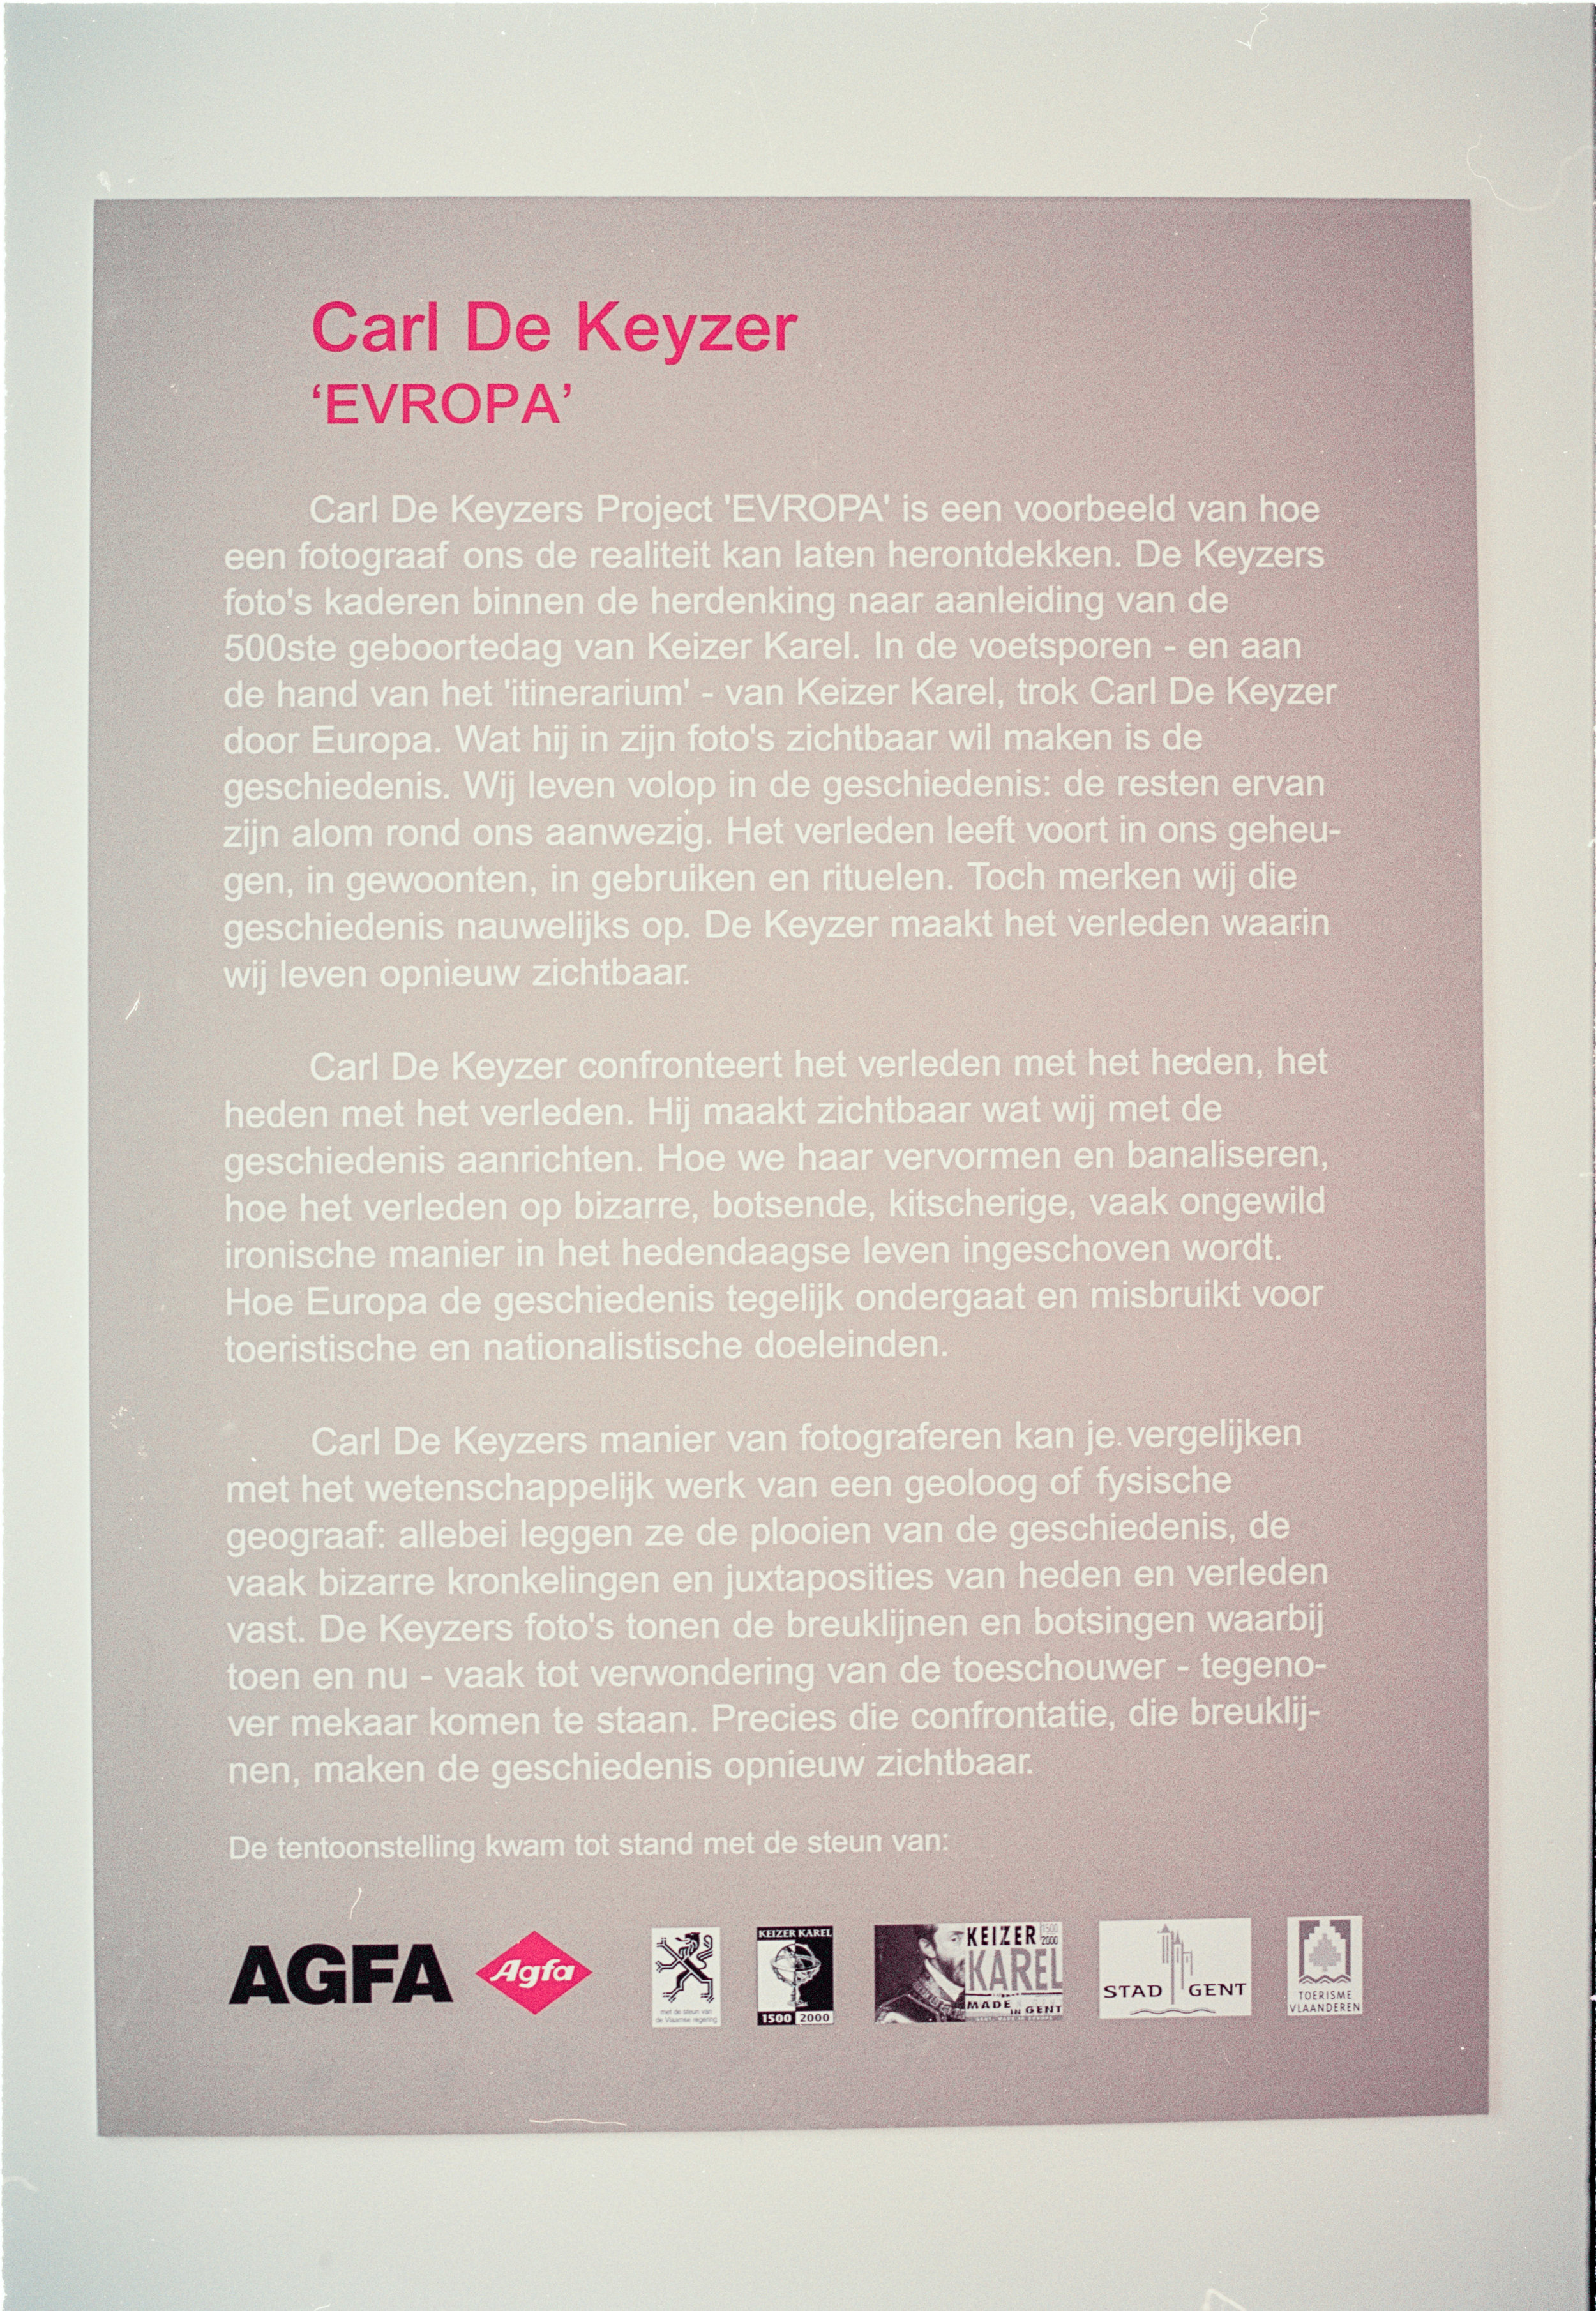 04-07-18-neg-kleur-expo-Europa-SMAK-2000-5 001.jpg